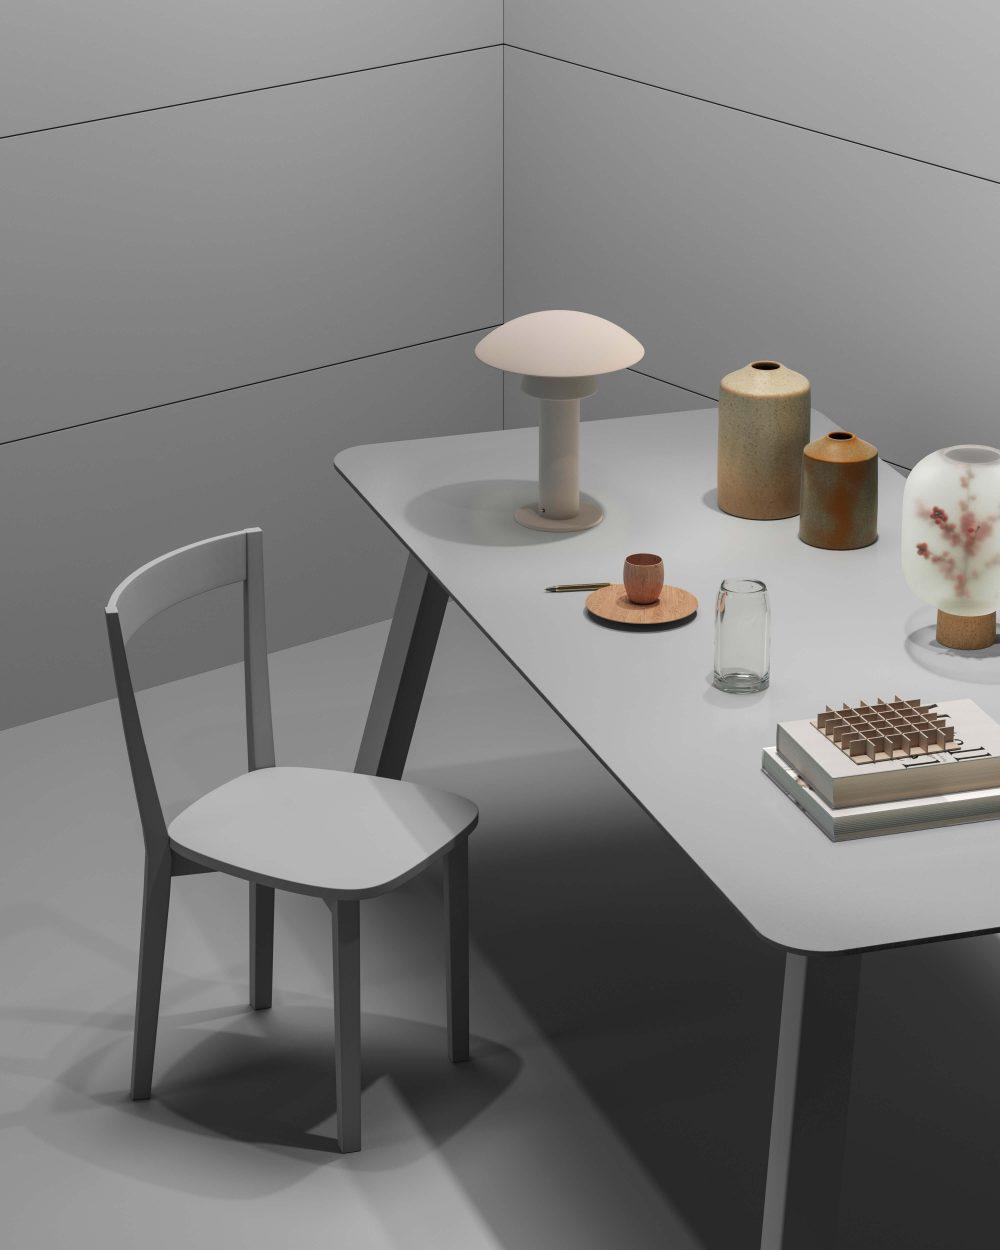 Tavolo e sedia Titti eleganti e minimal Garofoli - Garofoli